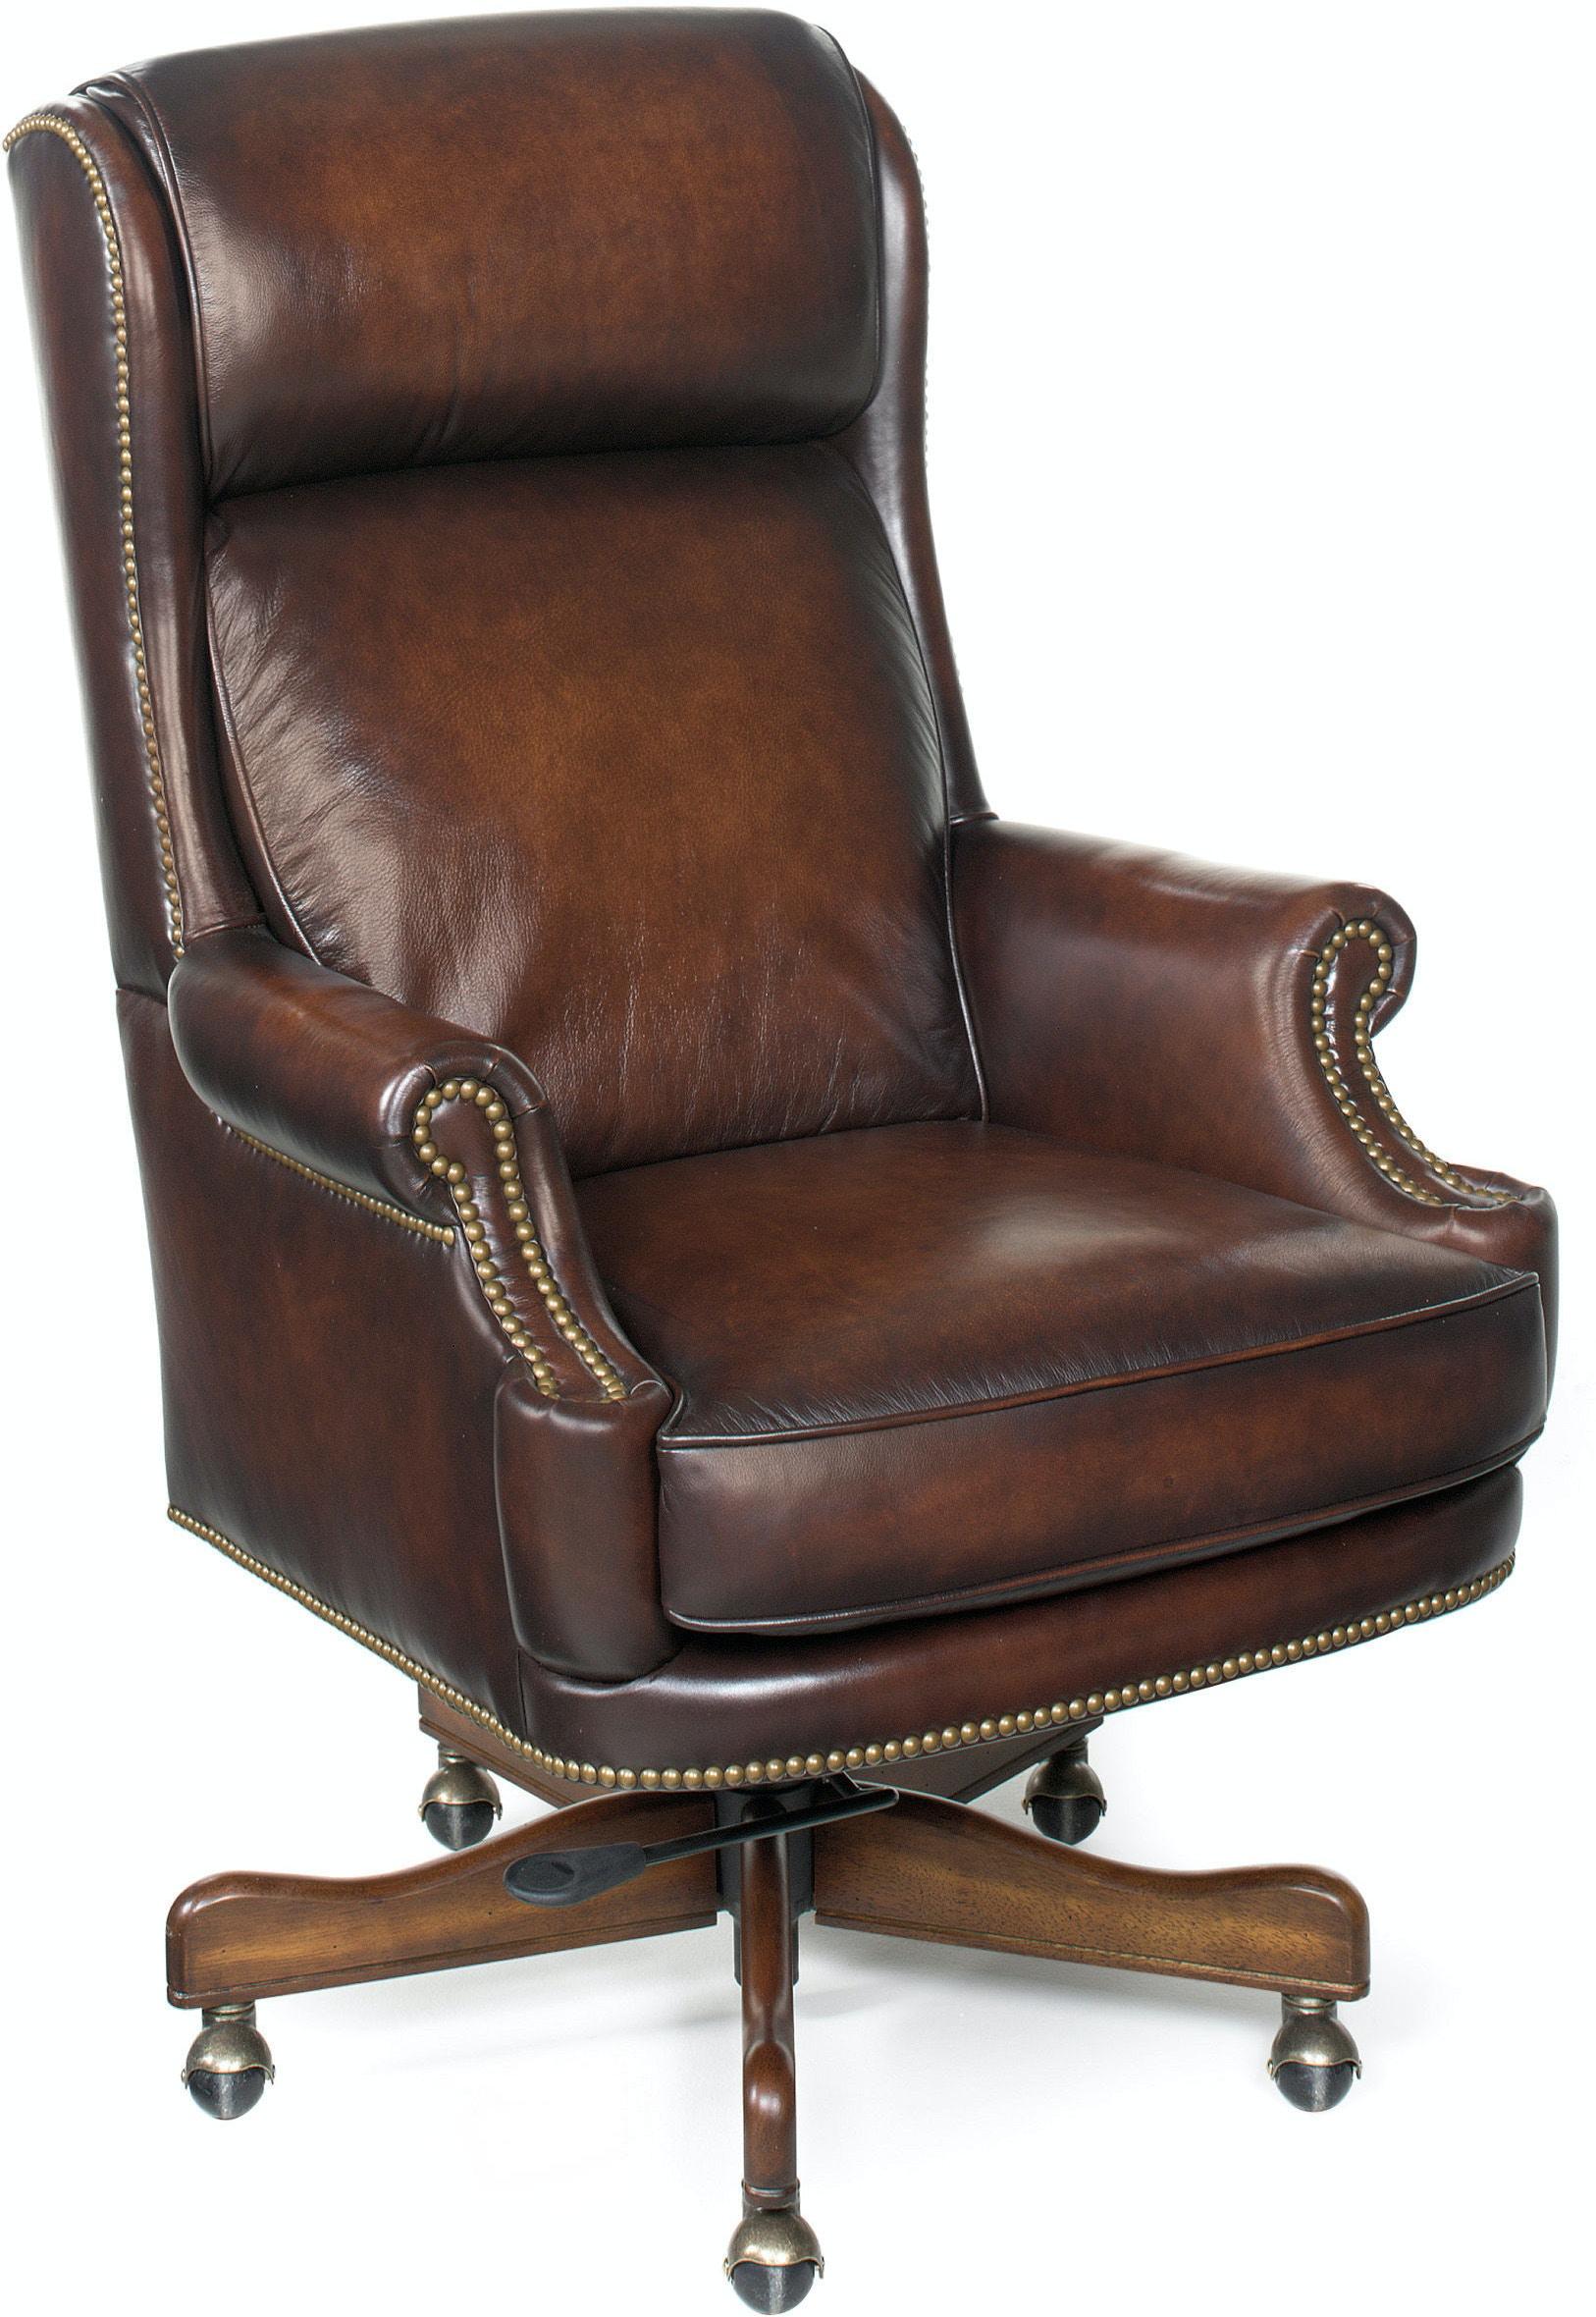 Hooker Furniture Home Office Kevin Executive Swivel Tilt Chair Ec293